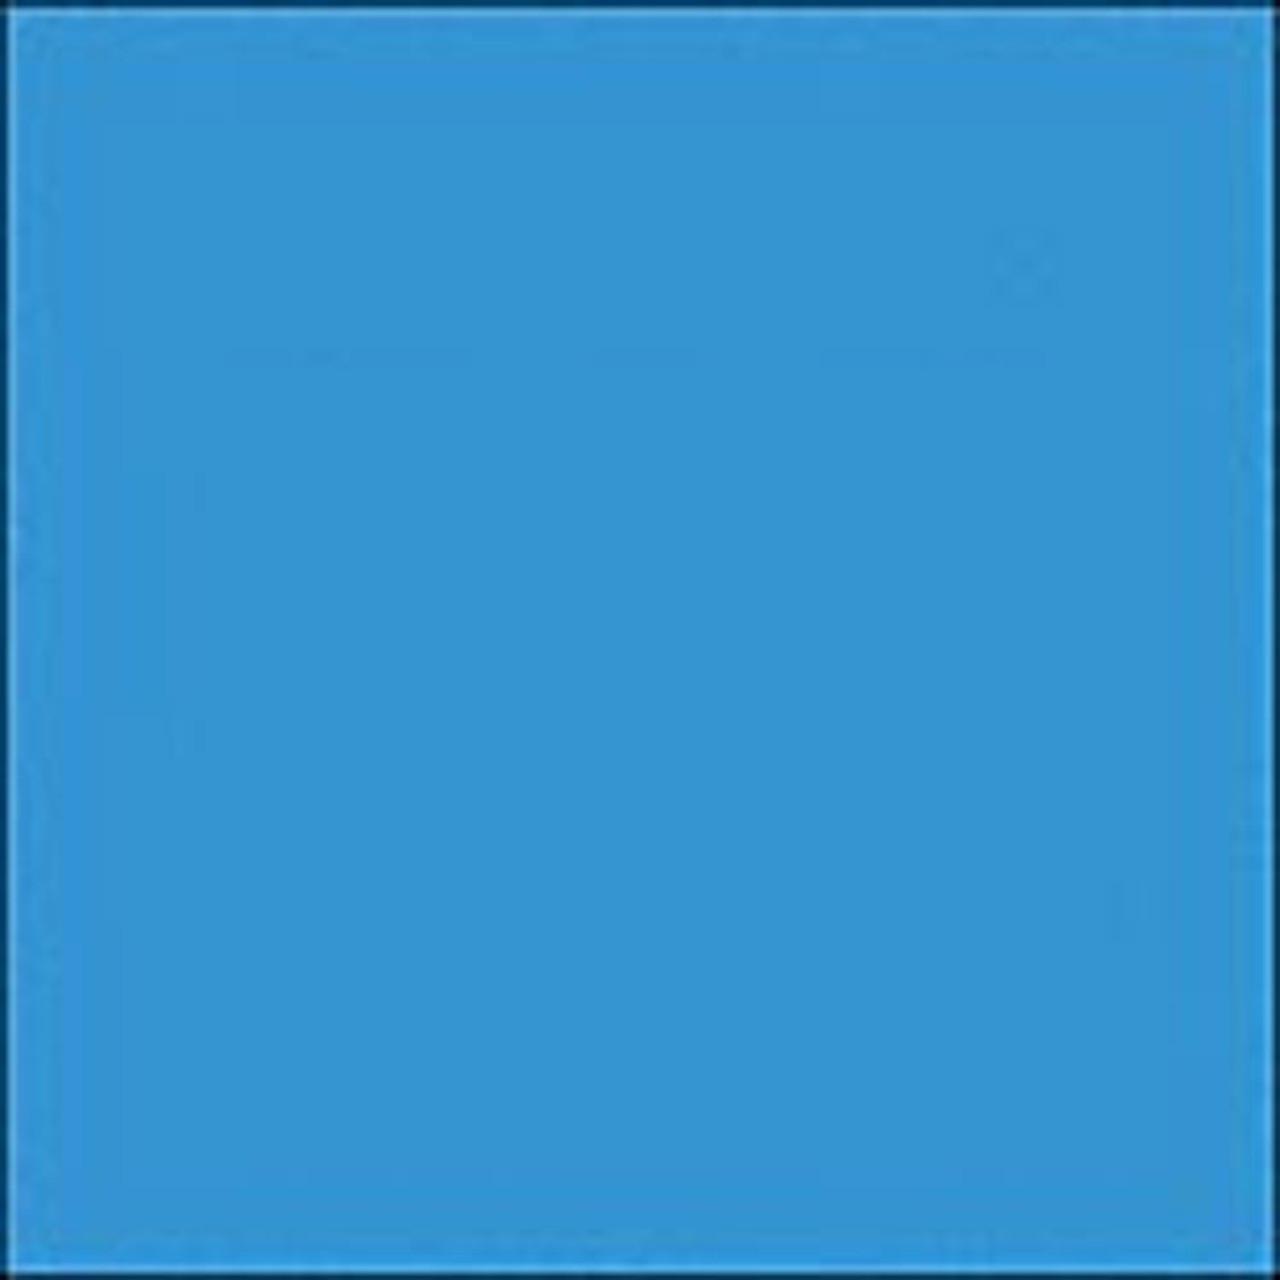 "#0362 Rosco Gels Roscolux Tipton Blue, 20x24"""